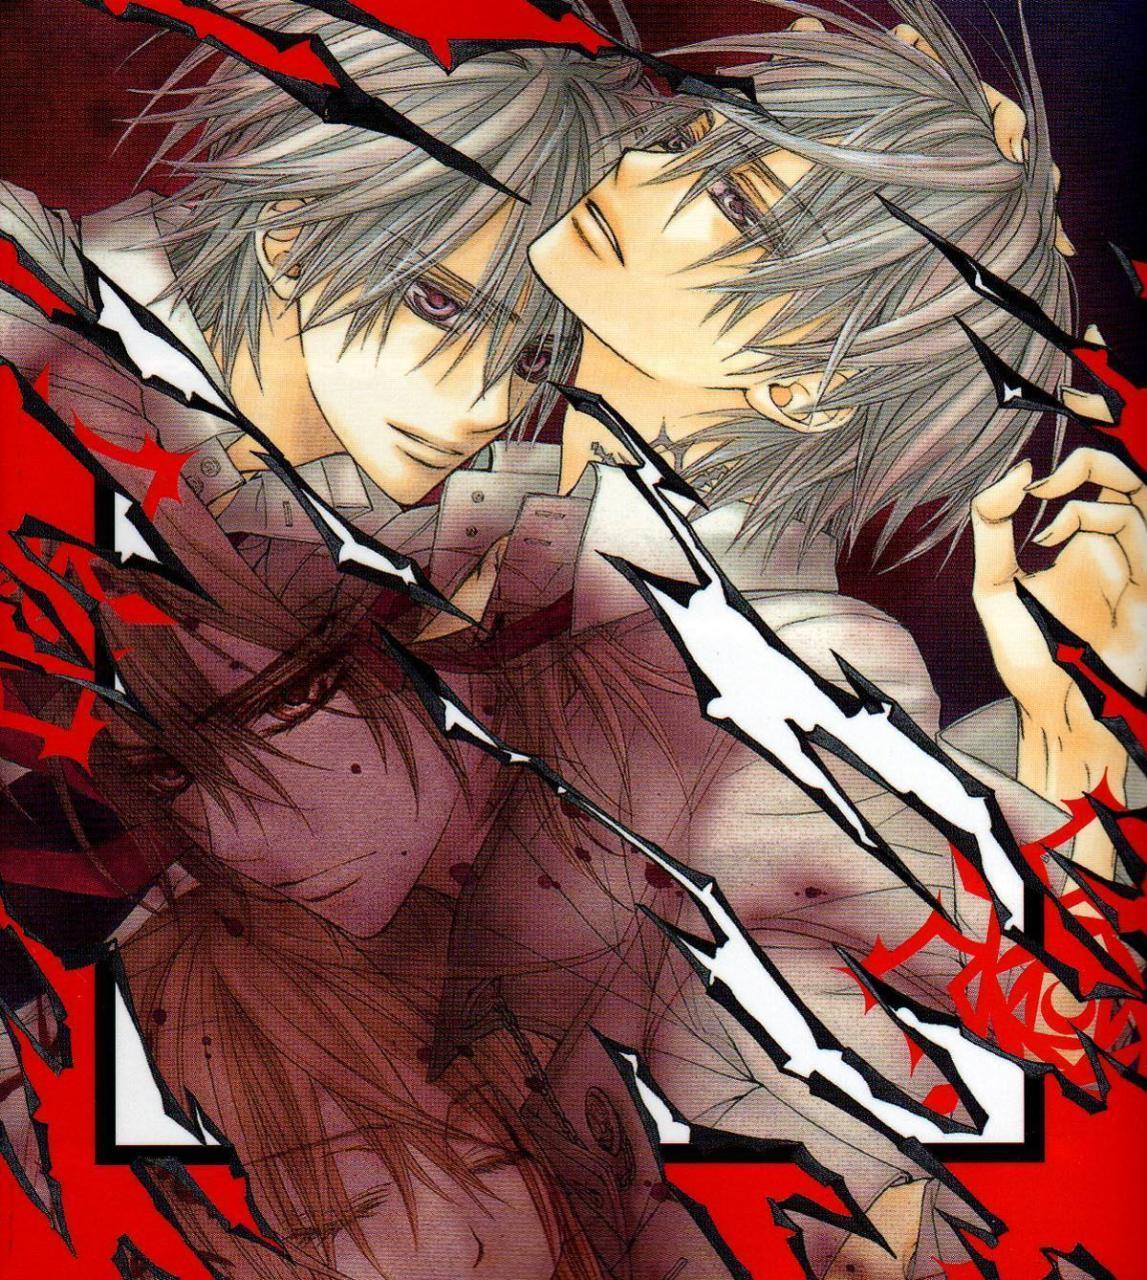 Vampire Knight *** Matsuri Hino*** - Page 8 2517450501_1273dd01c2_o